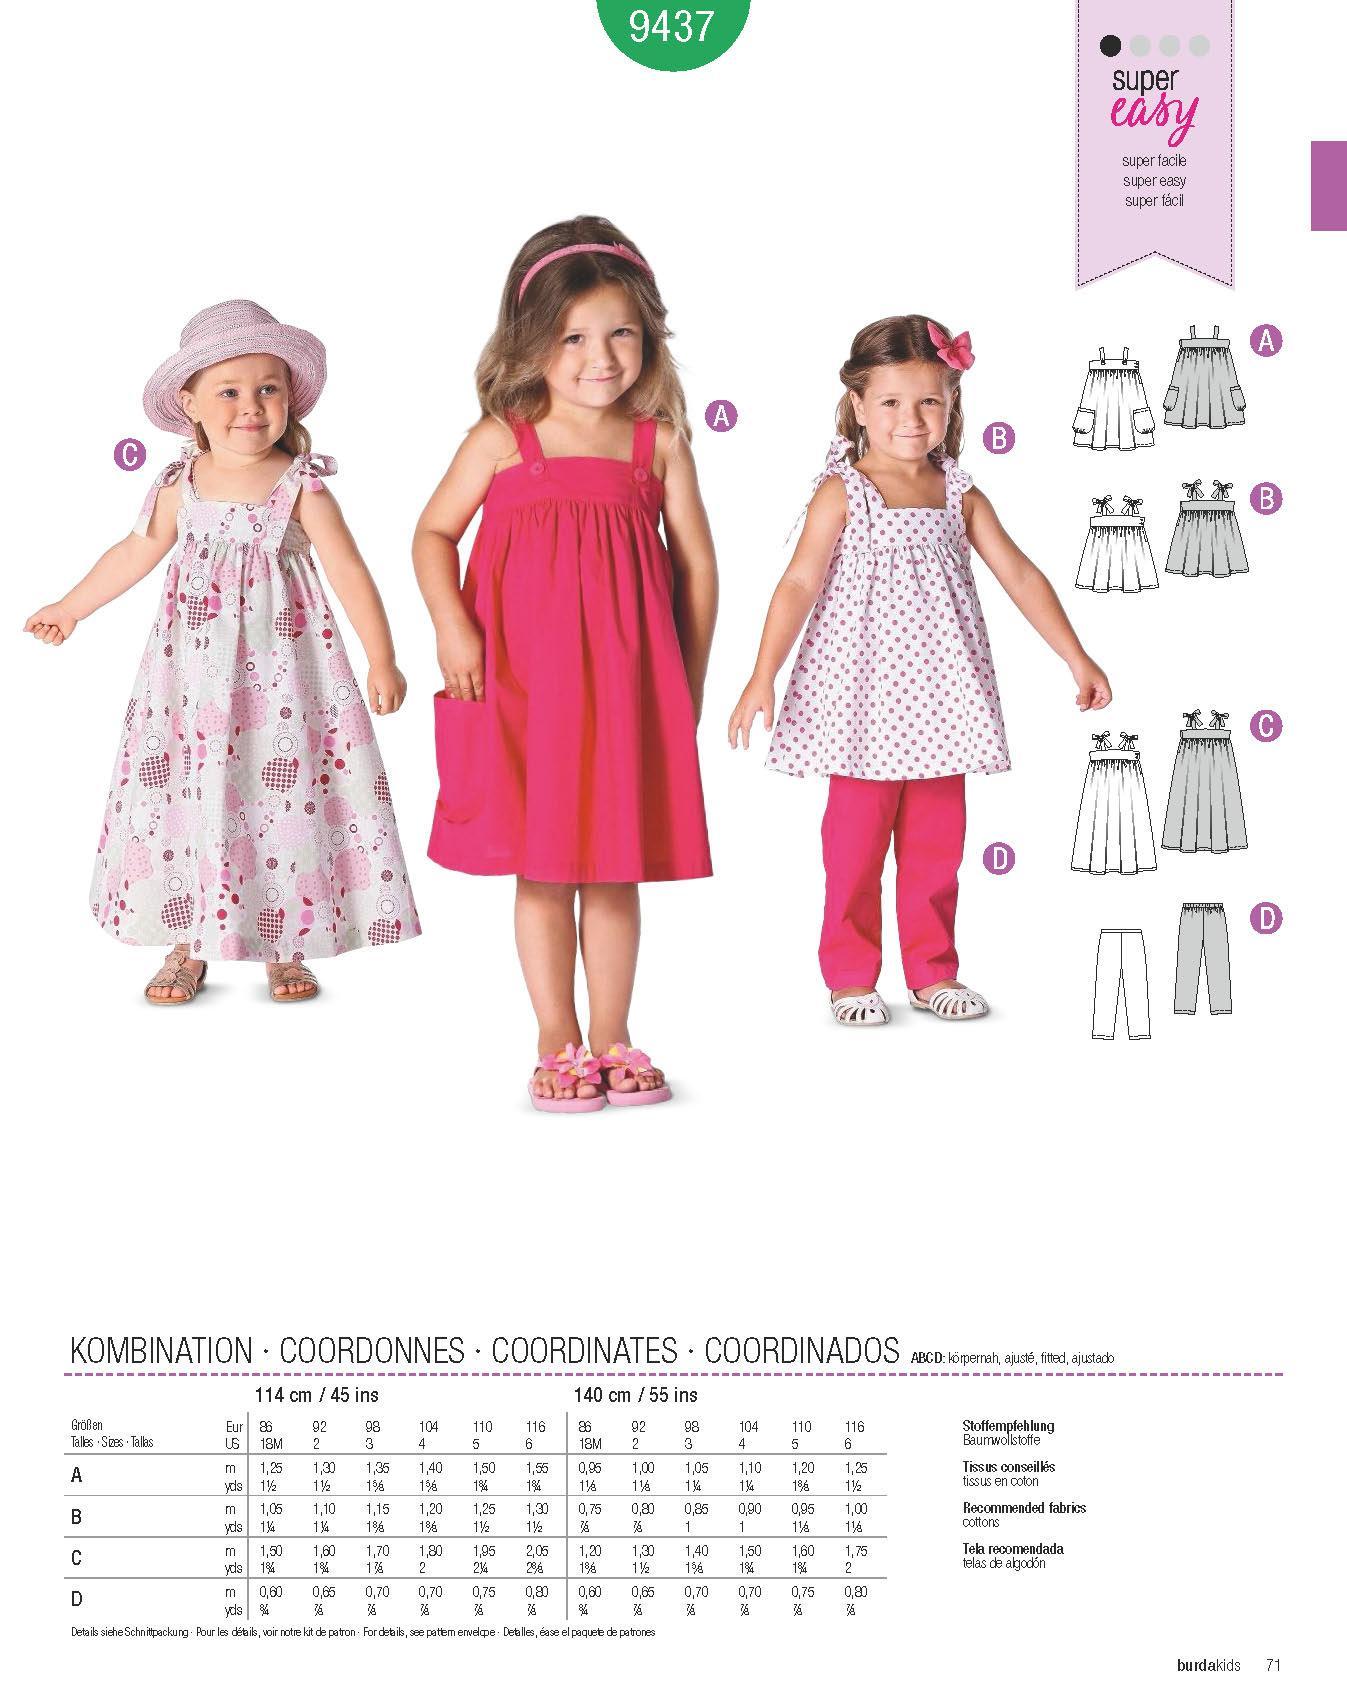 520a221d349 Μόδα για μικρά παιδιά: Πατρόν Burda Kids / 9437